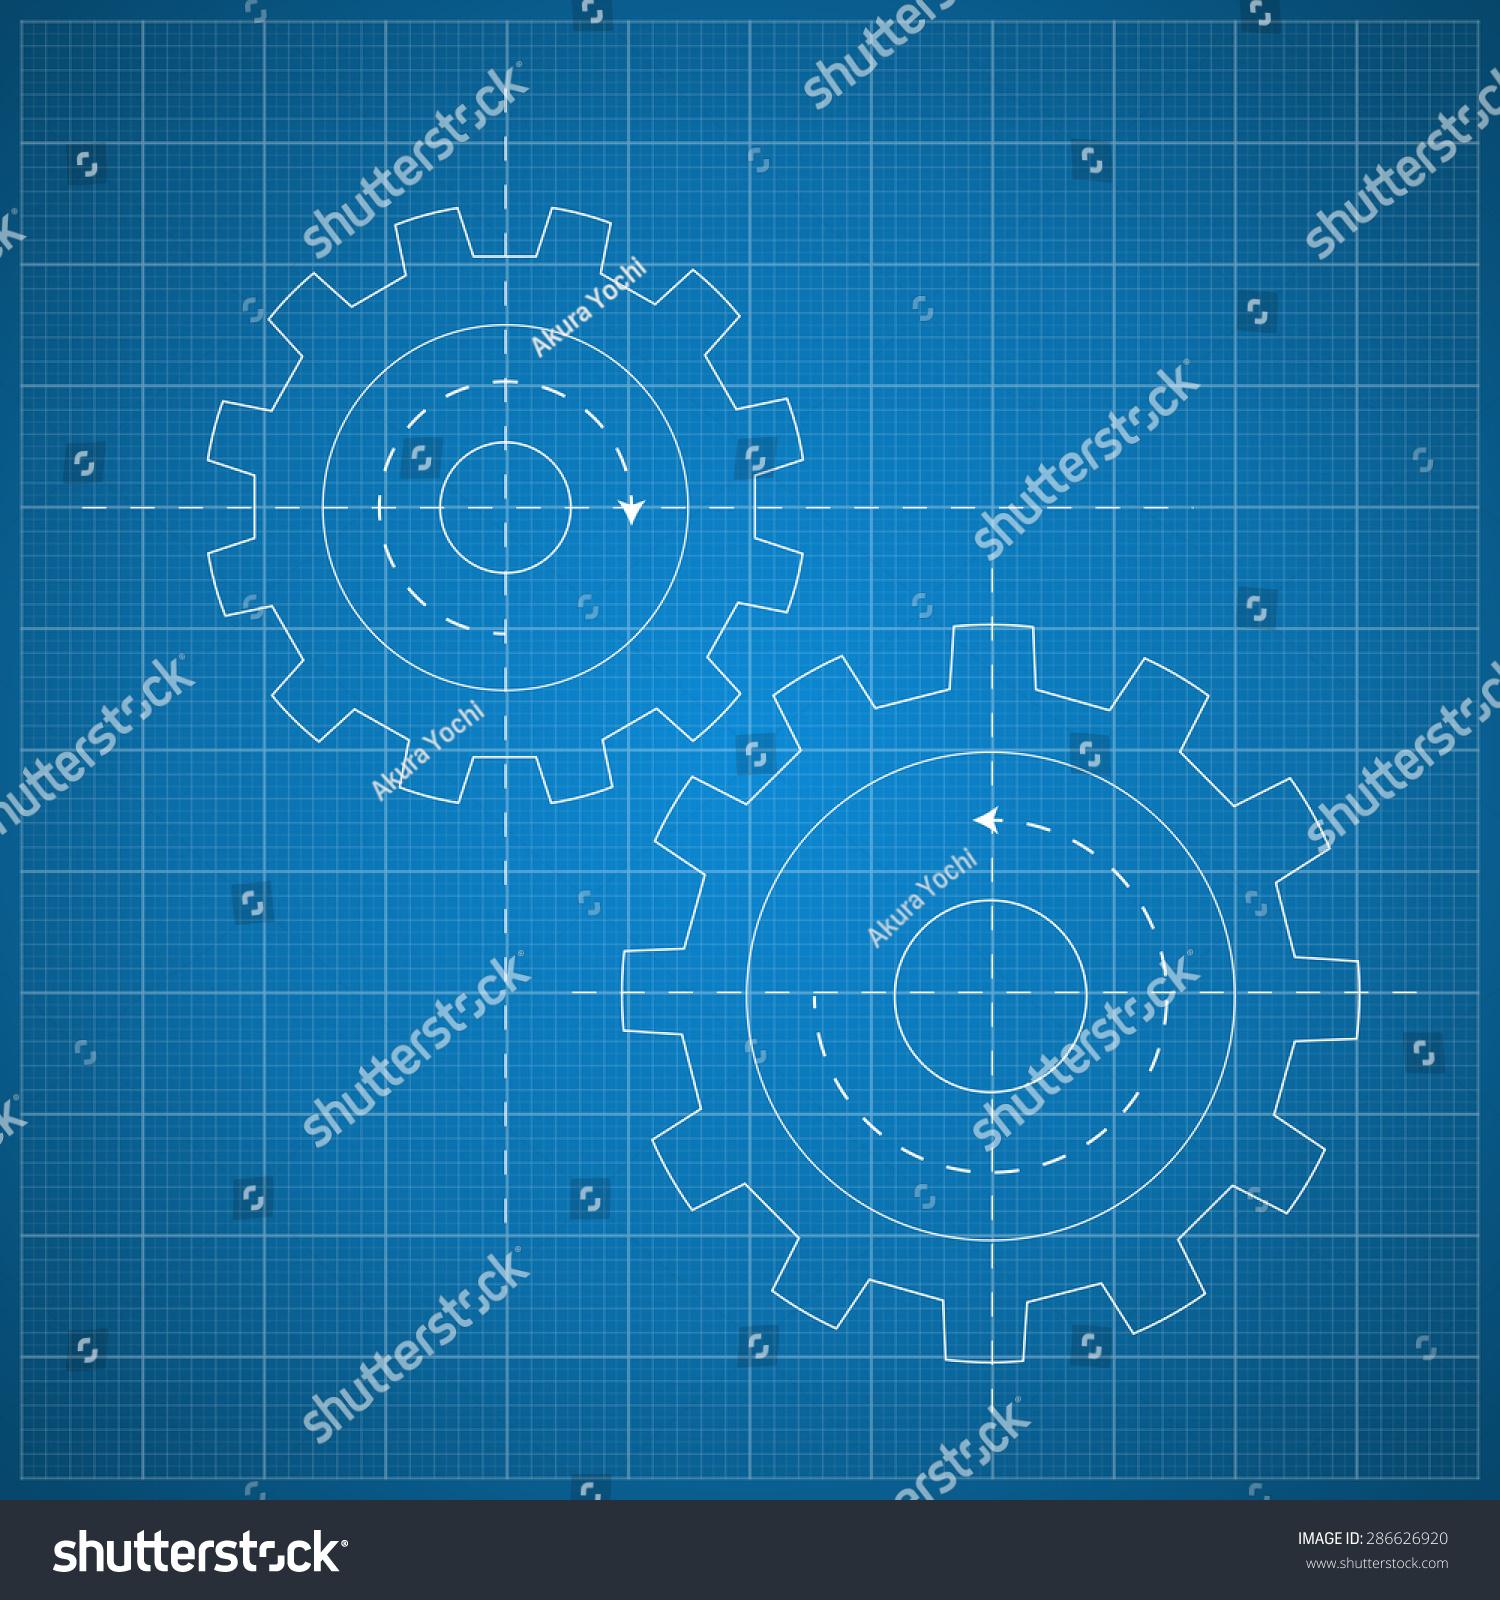 Gears symbol on blueprint paper background stock vector 286626920 gears symbol on the blueprint paper background concept mechanics engineering malvernweather Images